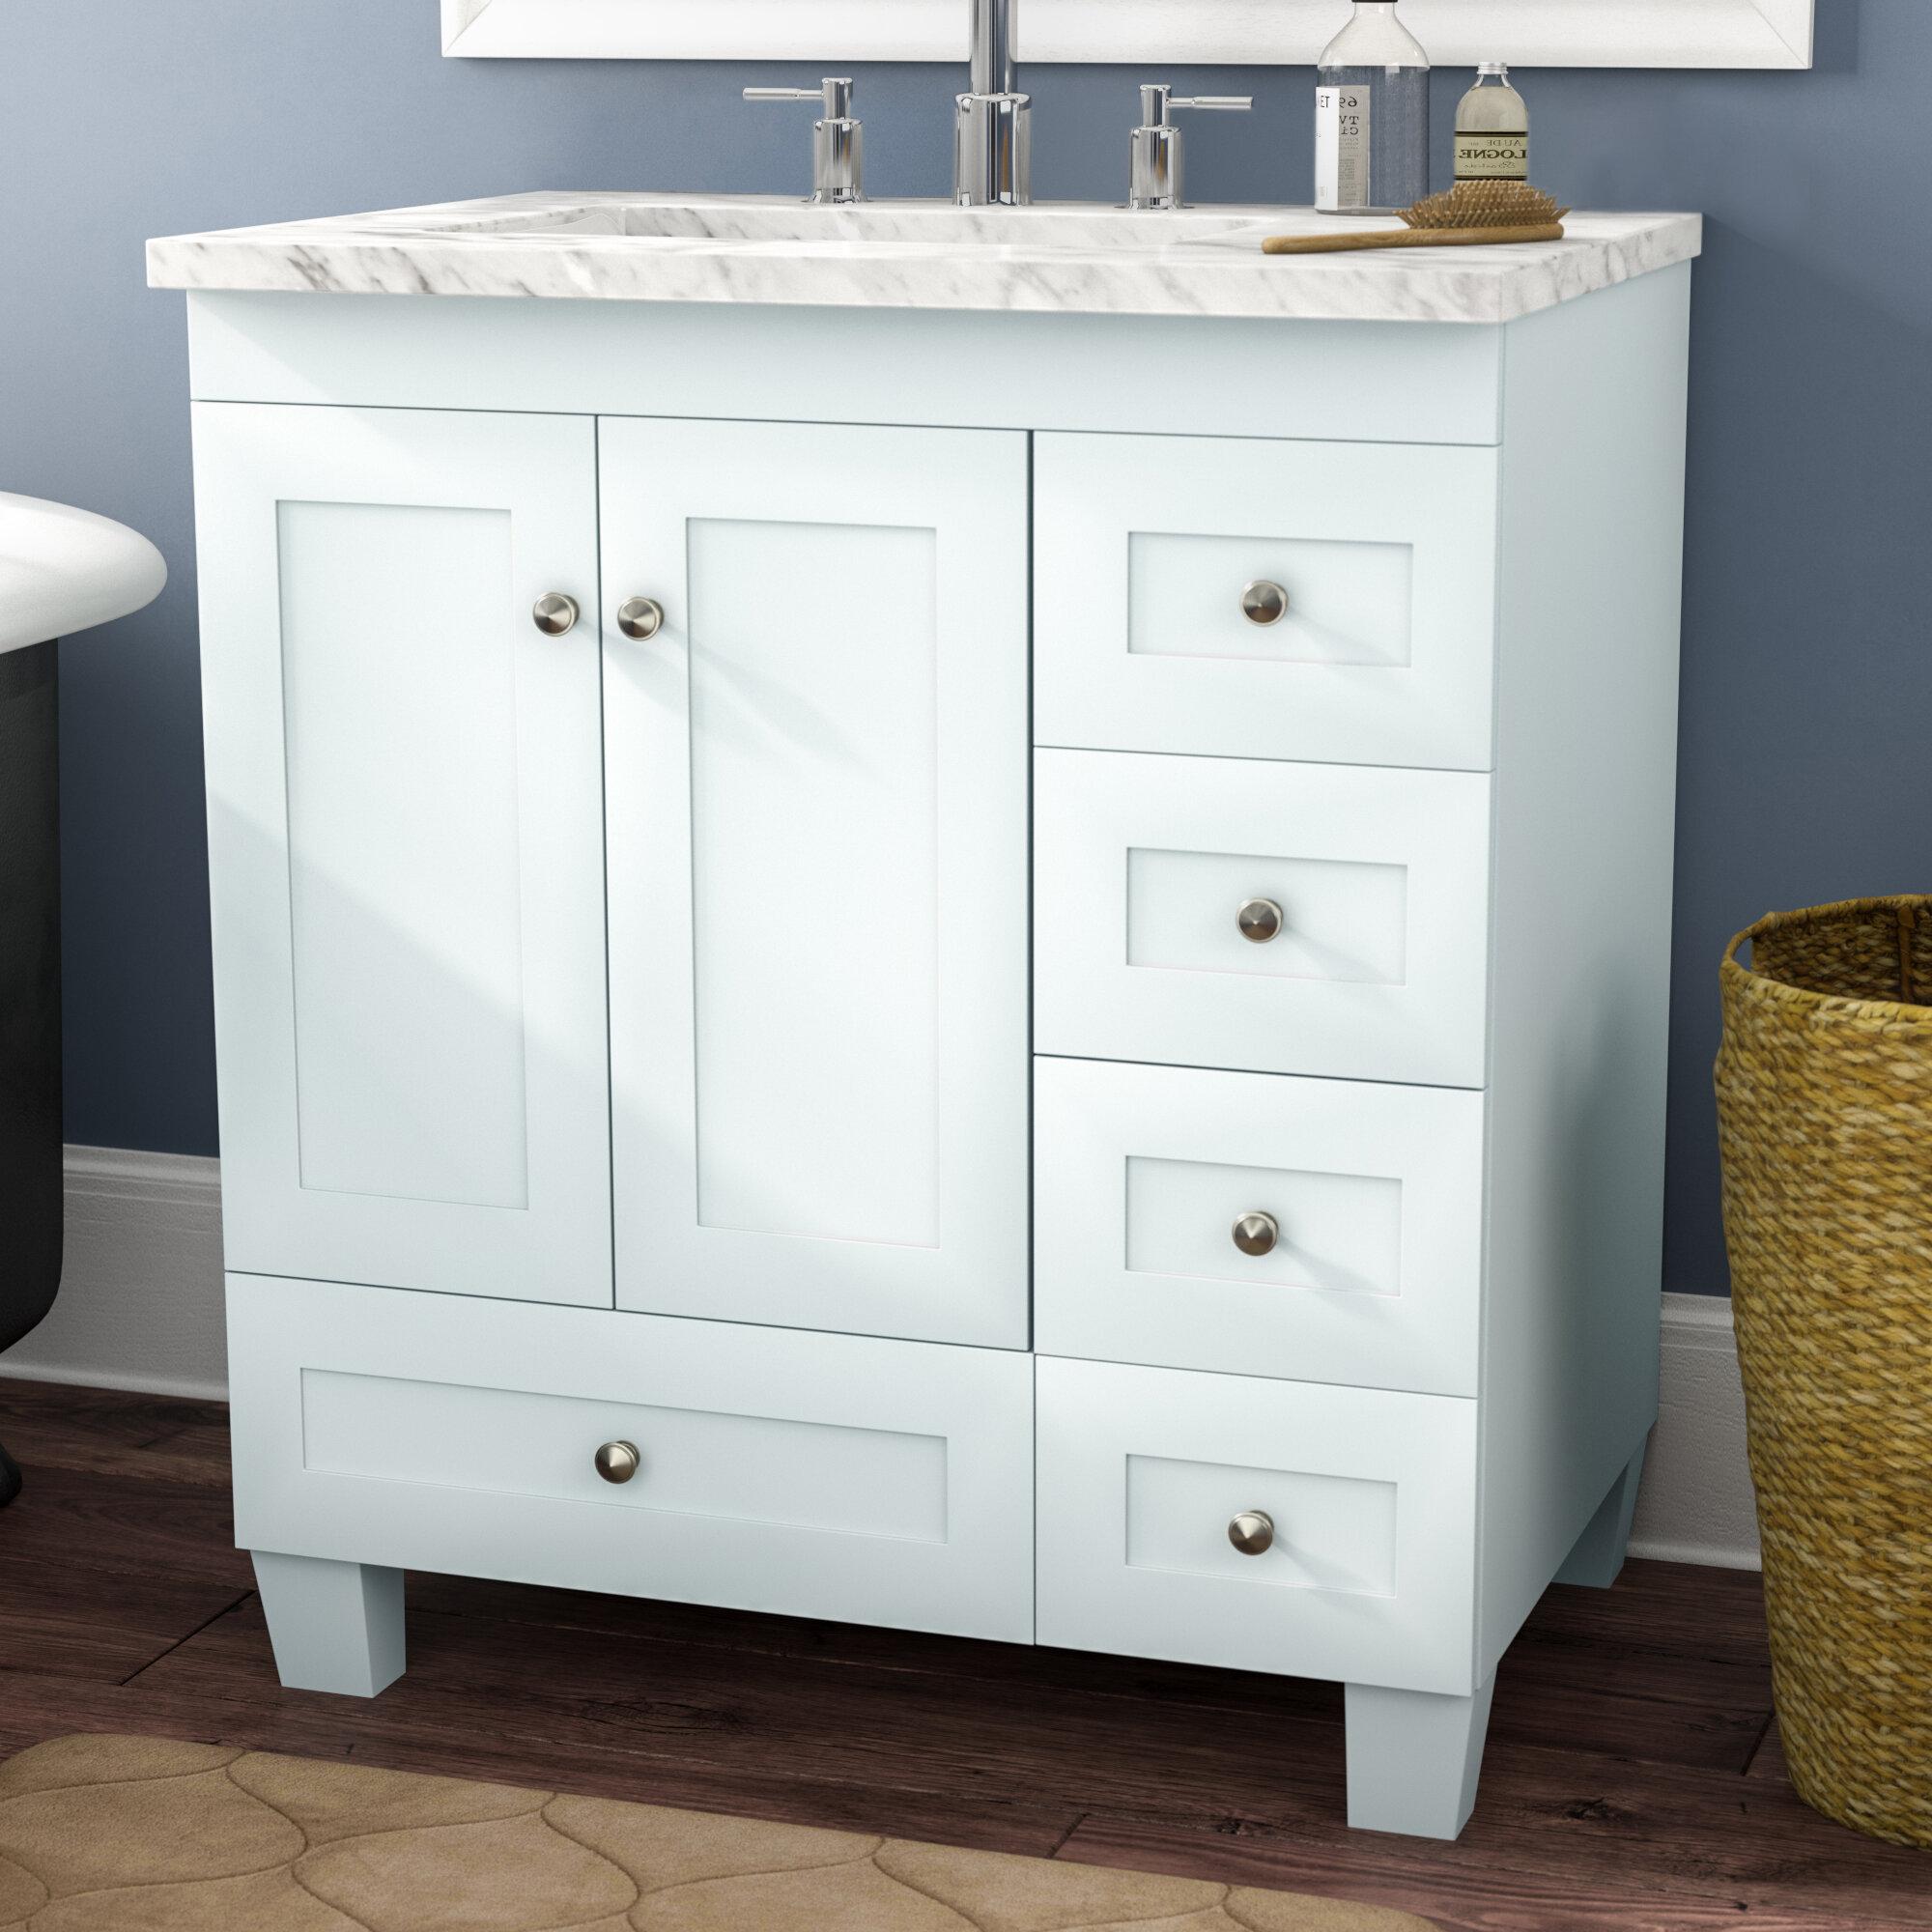 Lauder 31 Single Bathroom Vanity Set